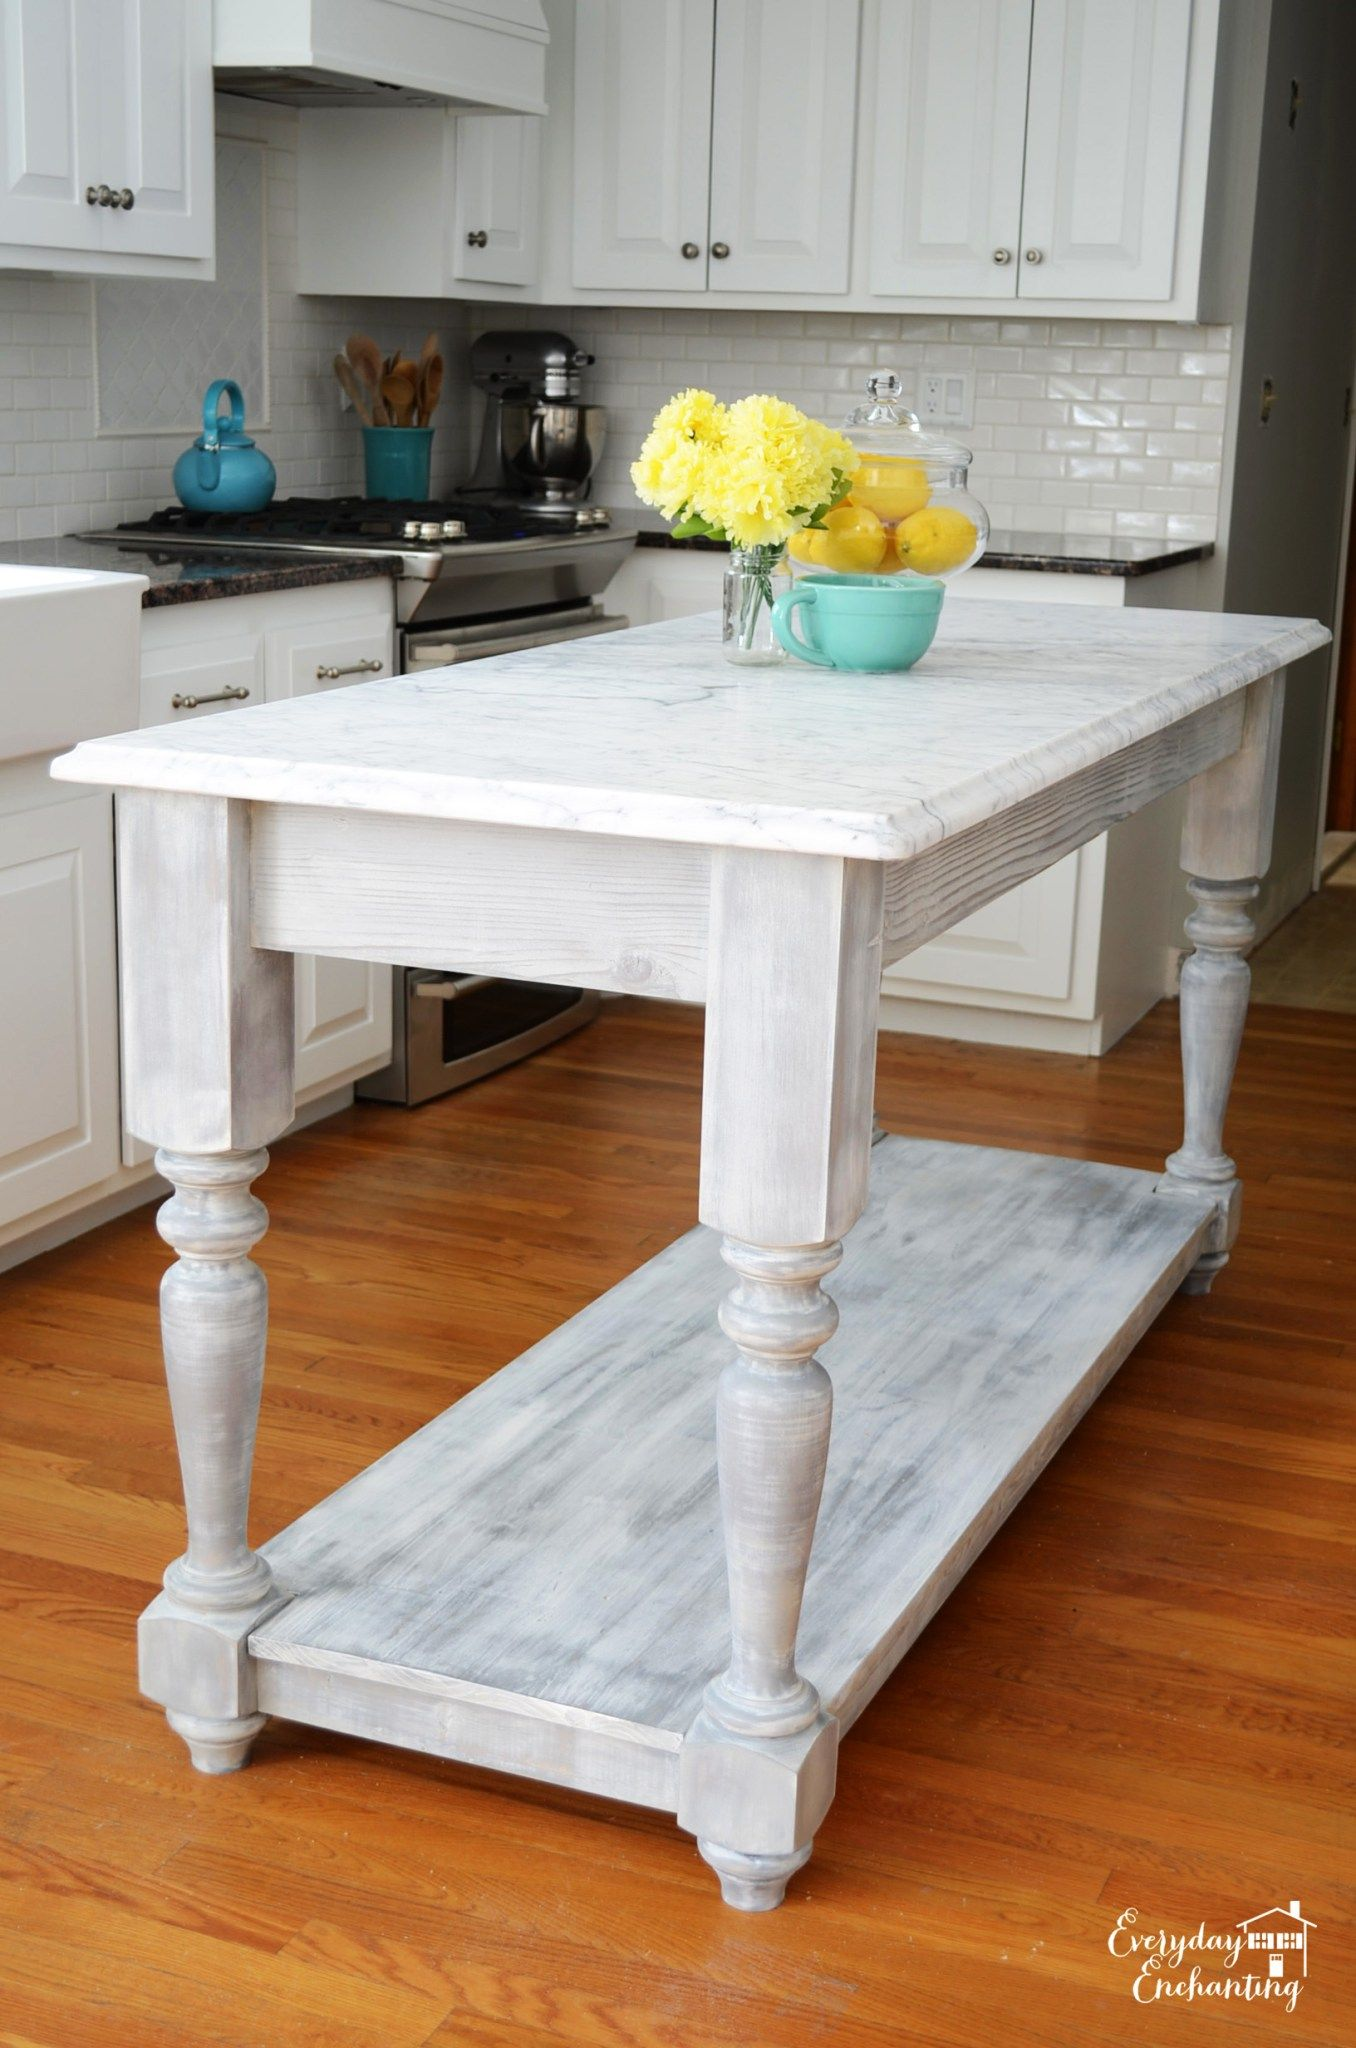 Build Your Own DIY Kitchen Island   Diy kitchen island, Kitchens and ...